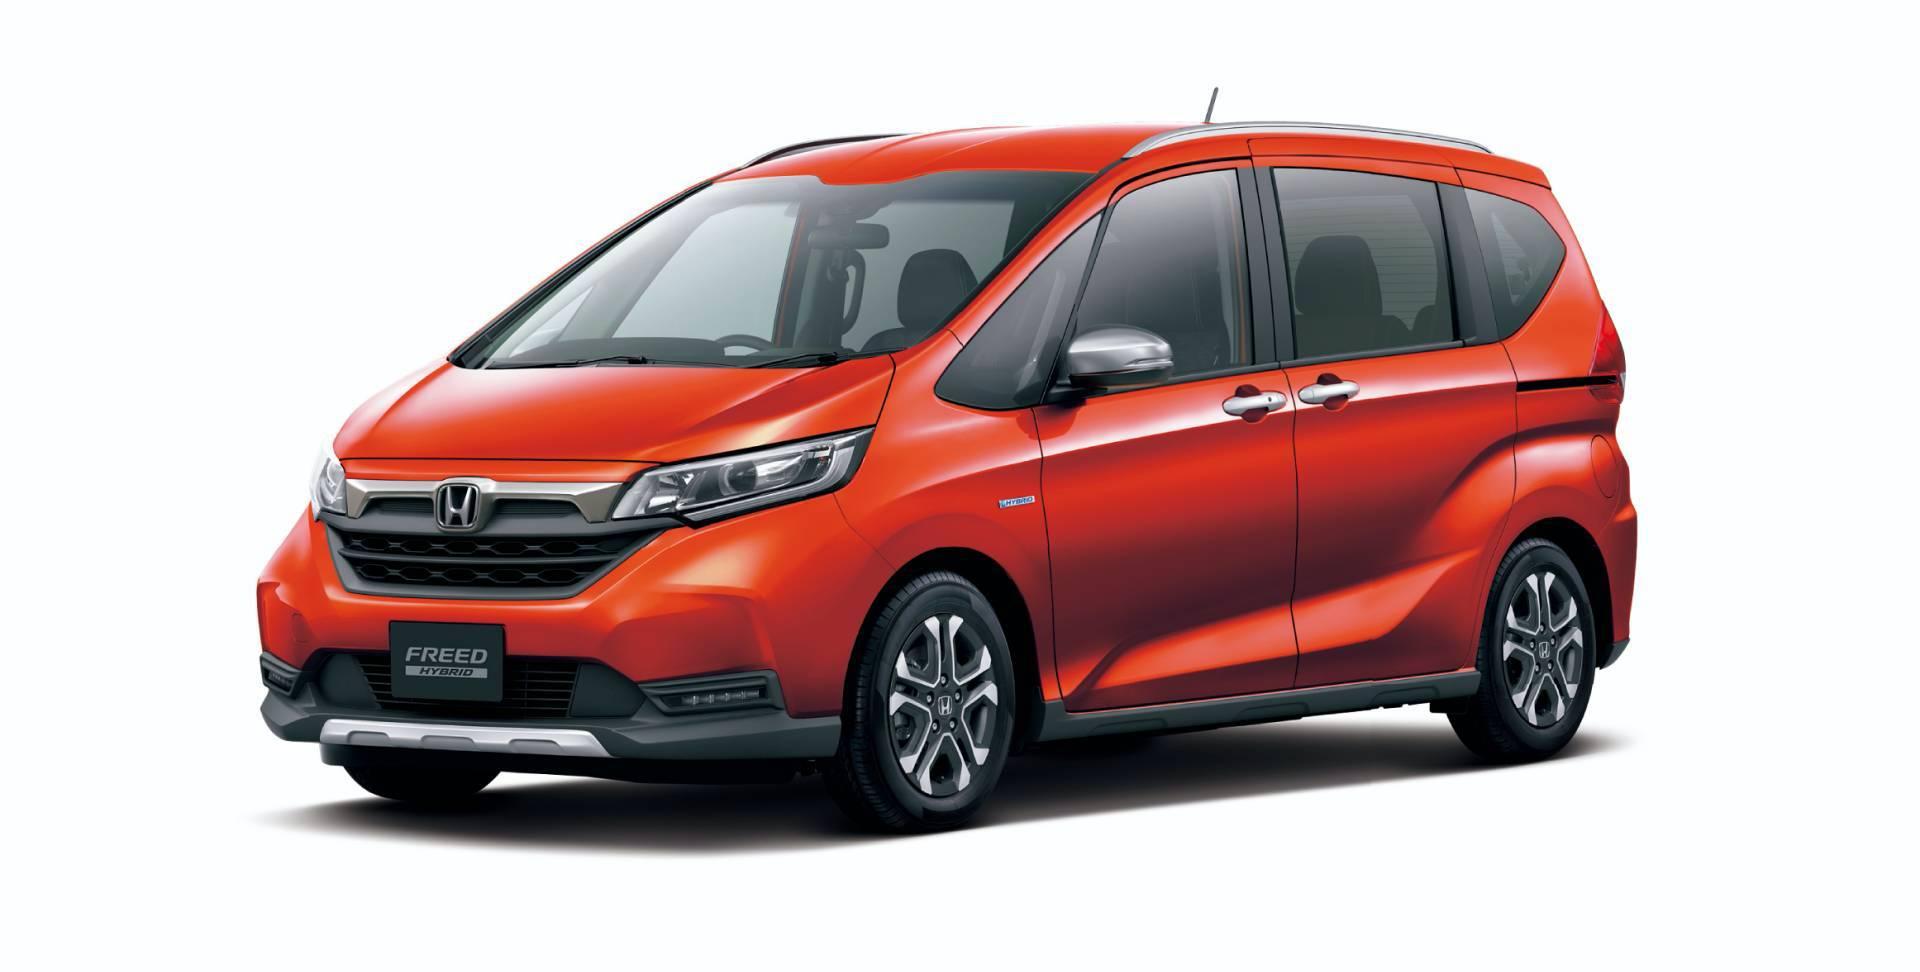 Honda-Freed-2020-6